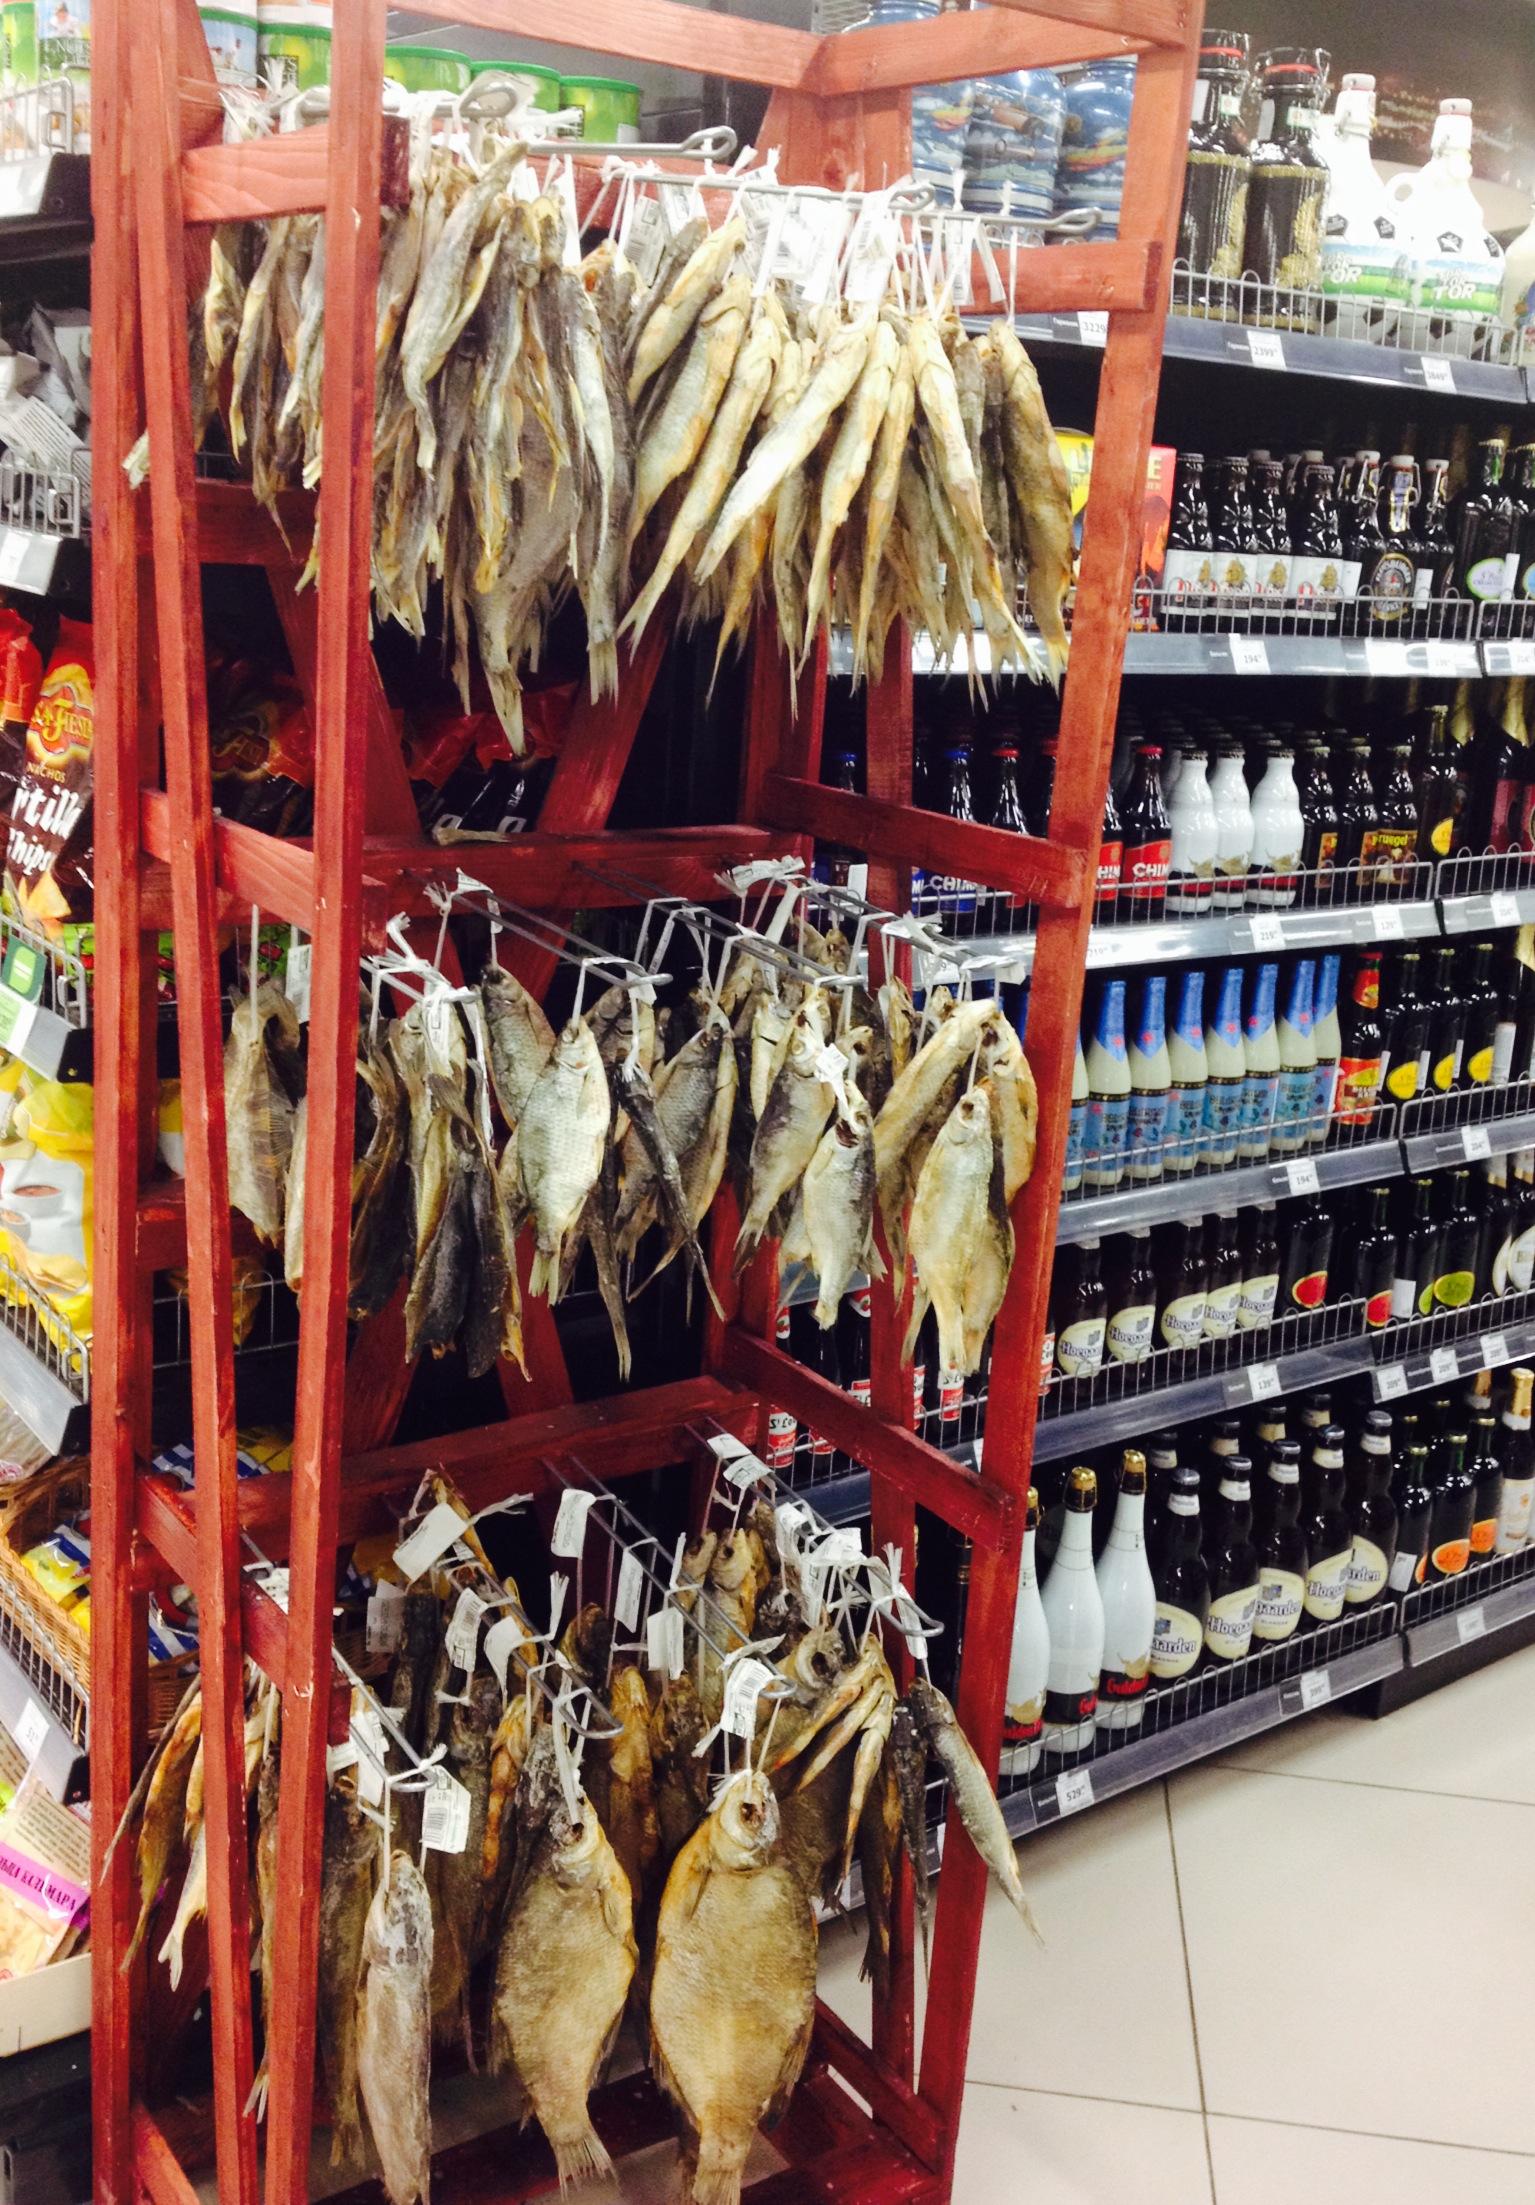 Wer keinen abgepackten Trockenfisch will, muss trotzdem nicht verzichten